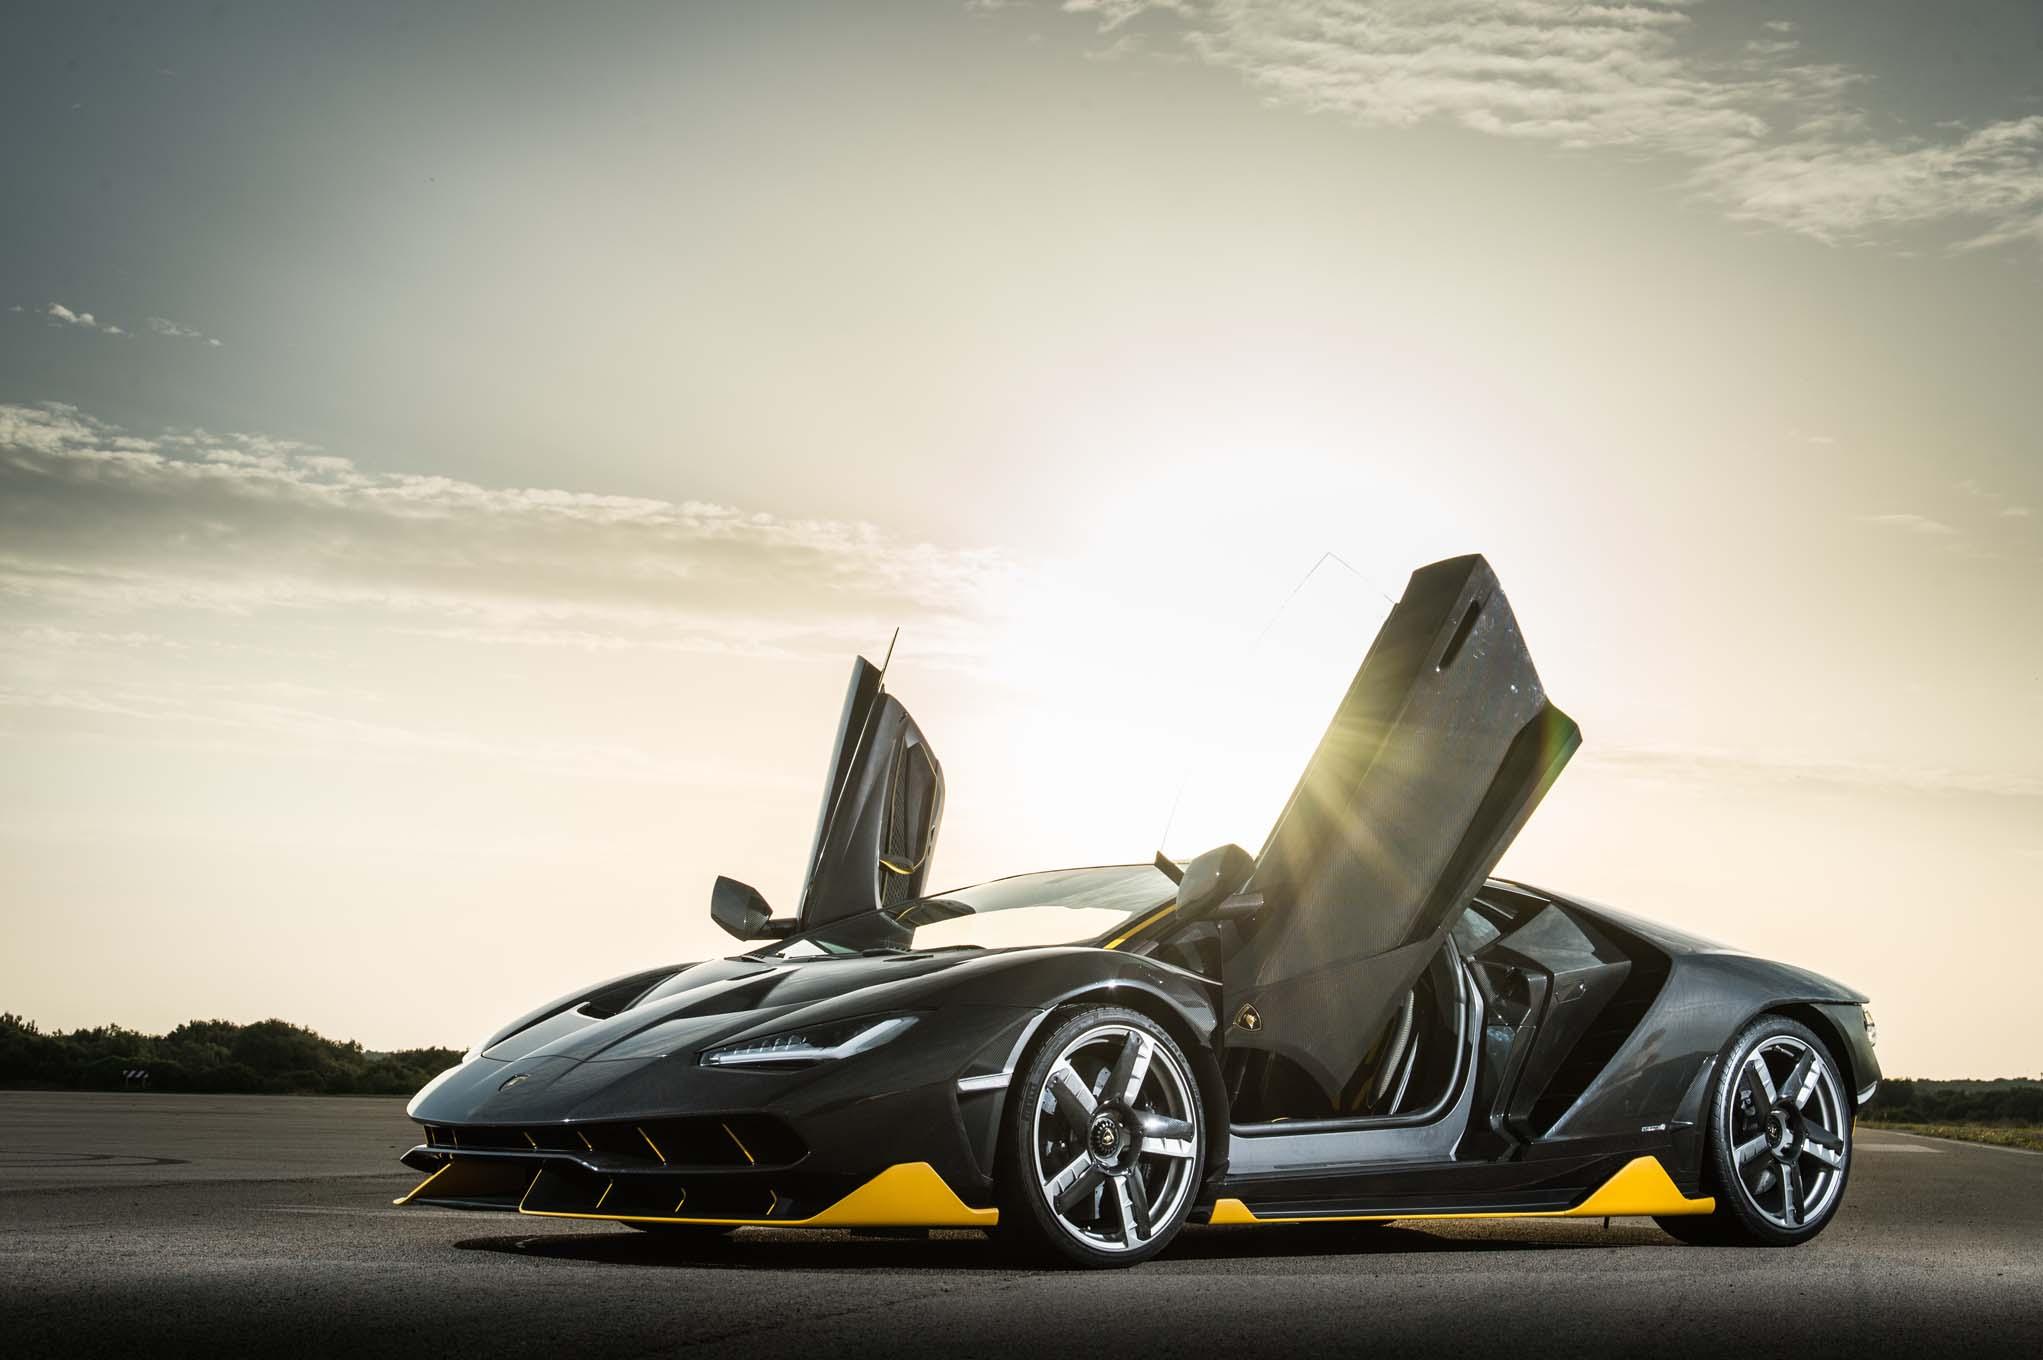 First U S Customer Receives Lamborghini Centenario Automobile